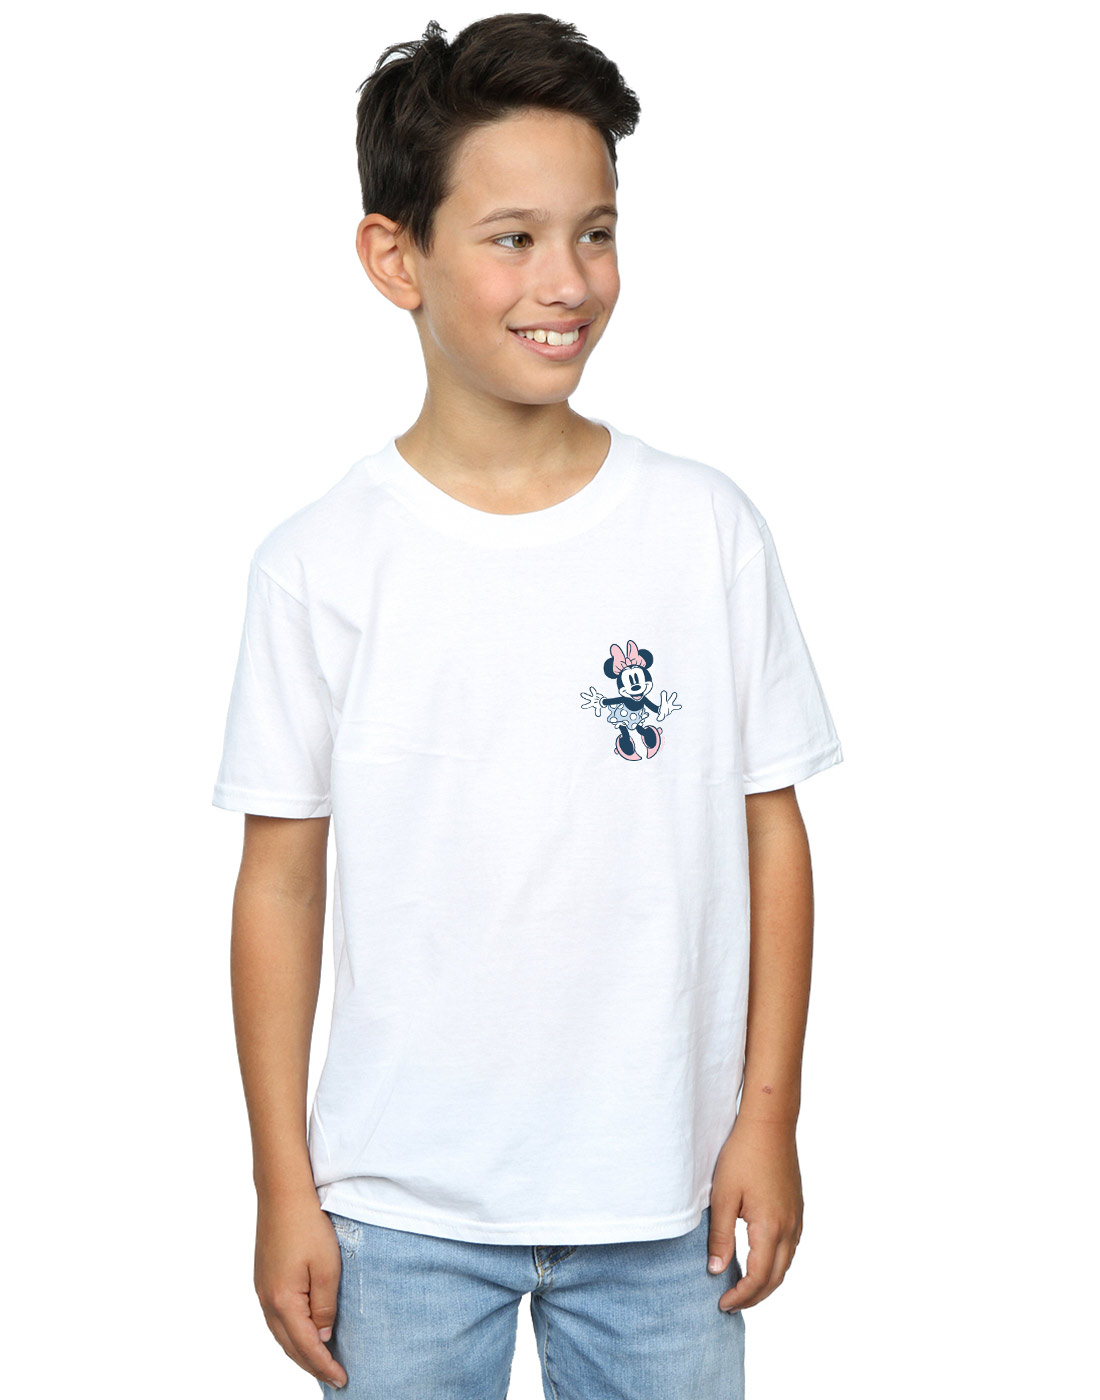 Disney-Ninos-Minnie-Mouse-Dancing-Chest-Camiseta